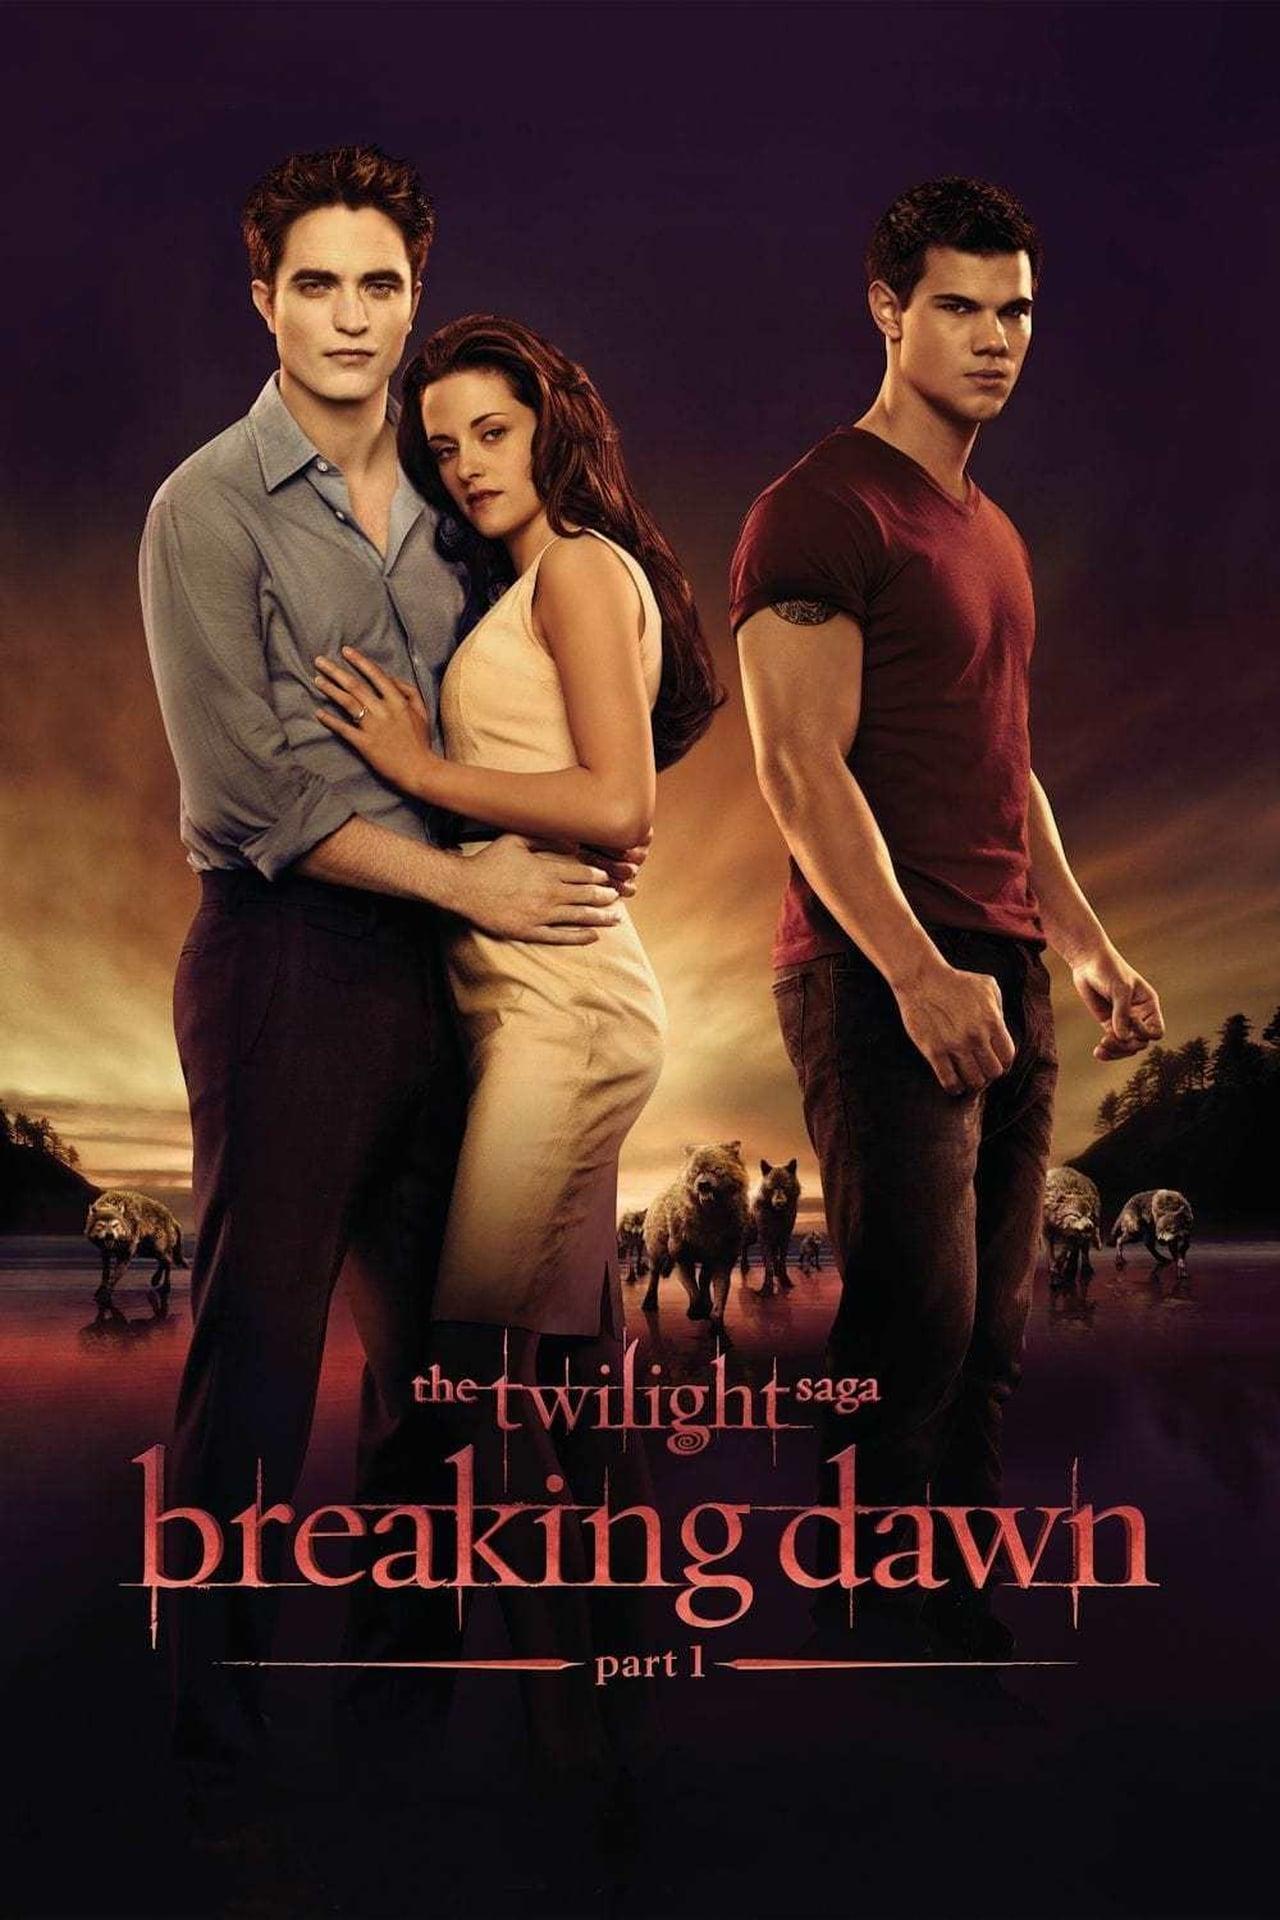 Download The Twilight Saga: Breaking Dawn – Part 1 (2011) [Hindi-English] 480p [350MB] | 720p [850MB] | 1080p [3GB]